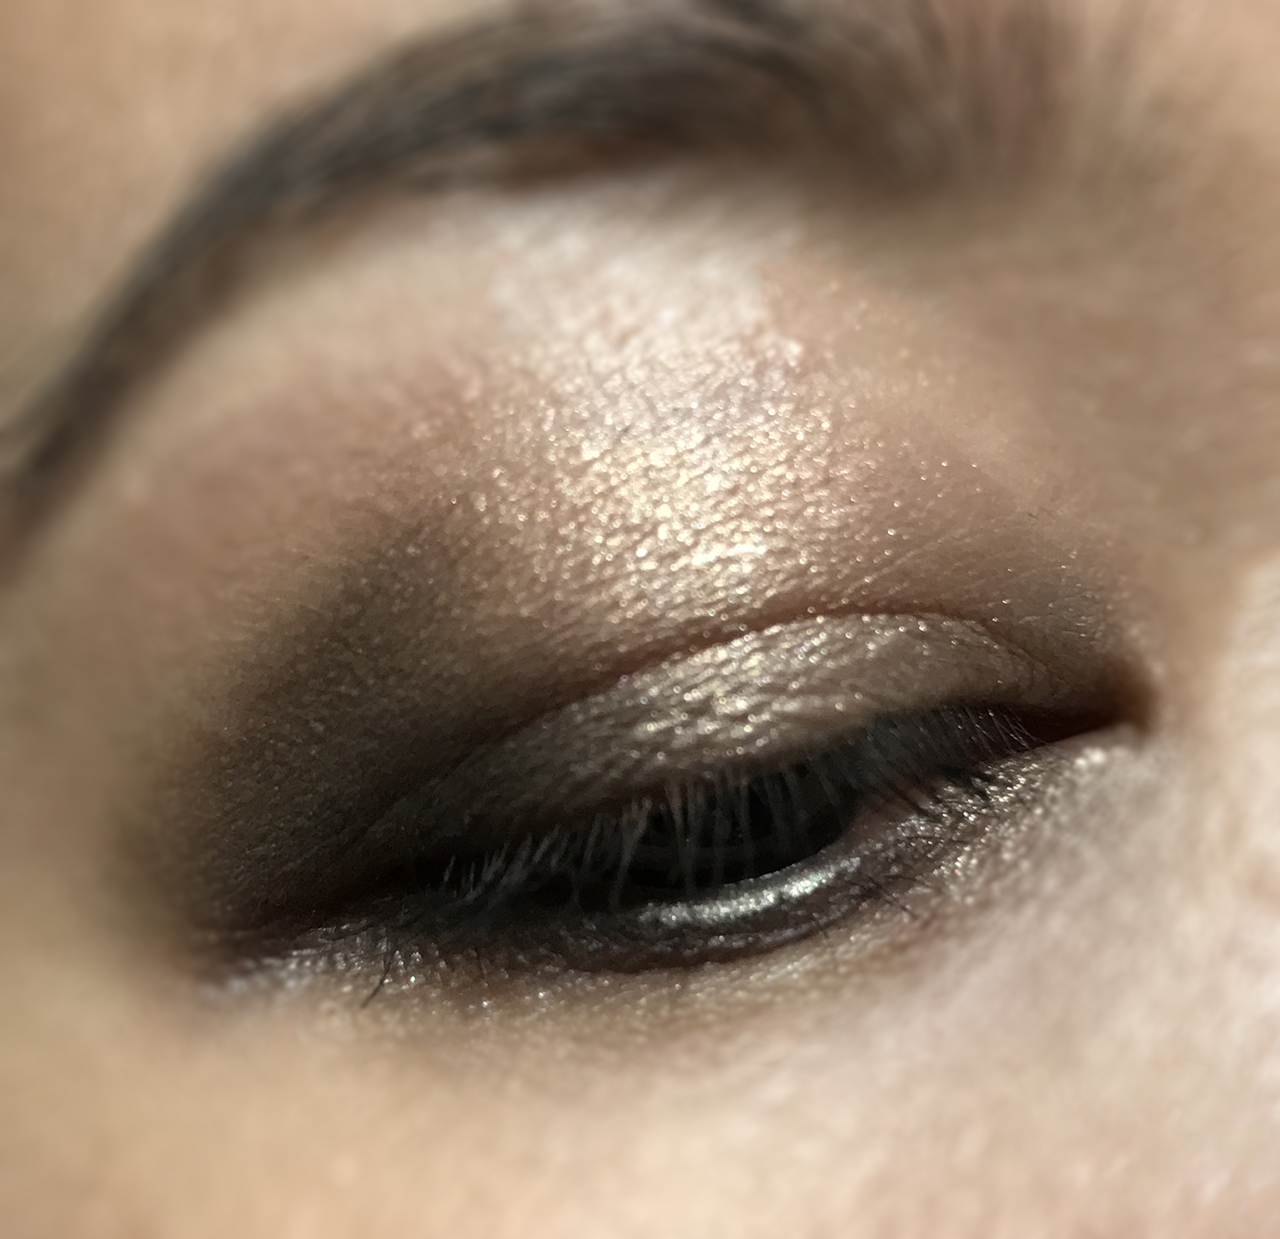 Bobbi Brown Sultry Nude Eye & Cheek Palette eye makeup